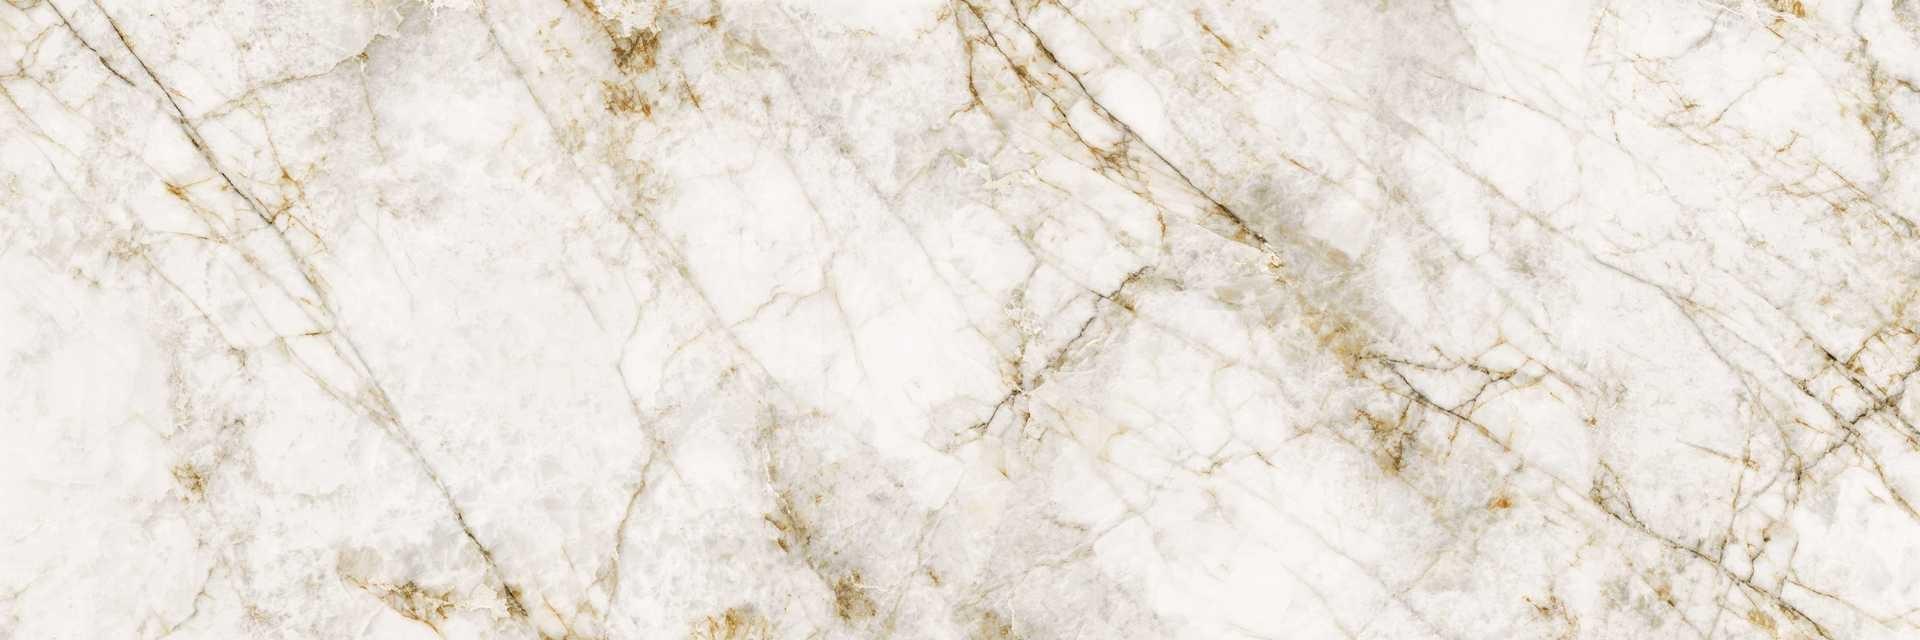 Obklad/dlažba Cuarzo Reno 120x260 cm, lesk